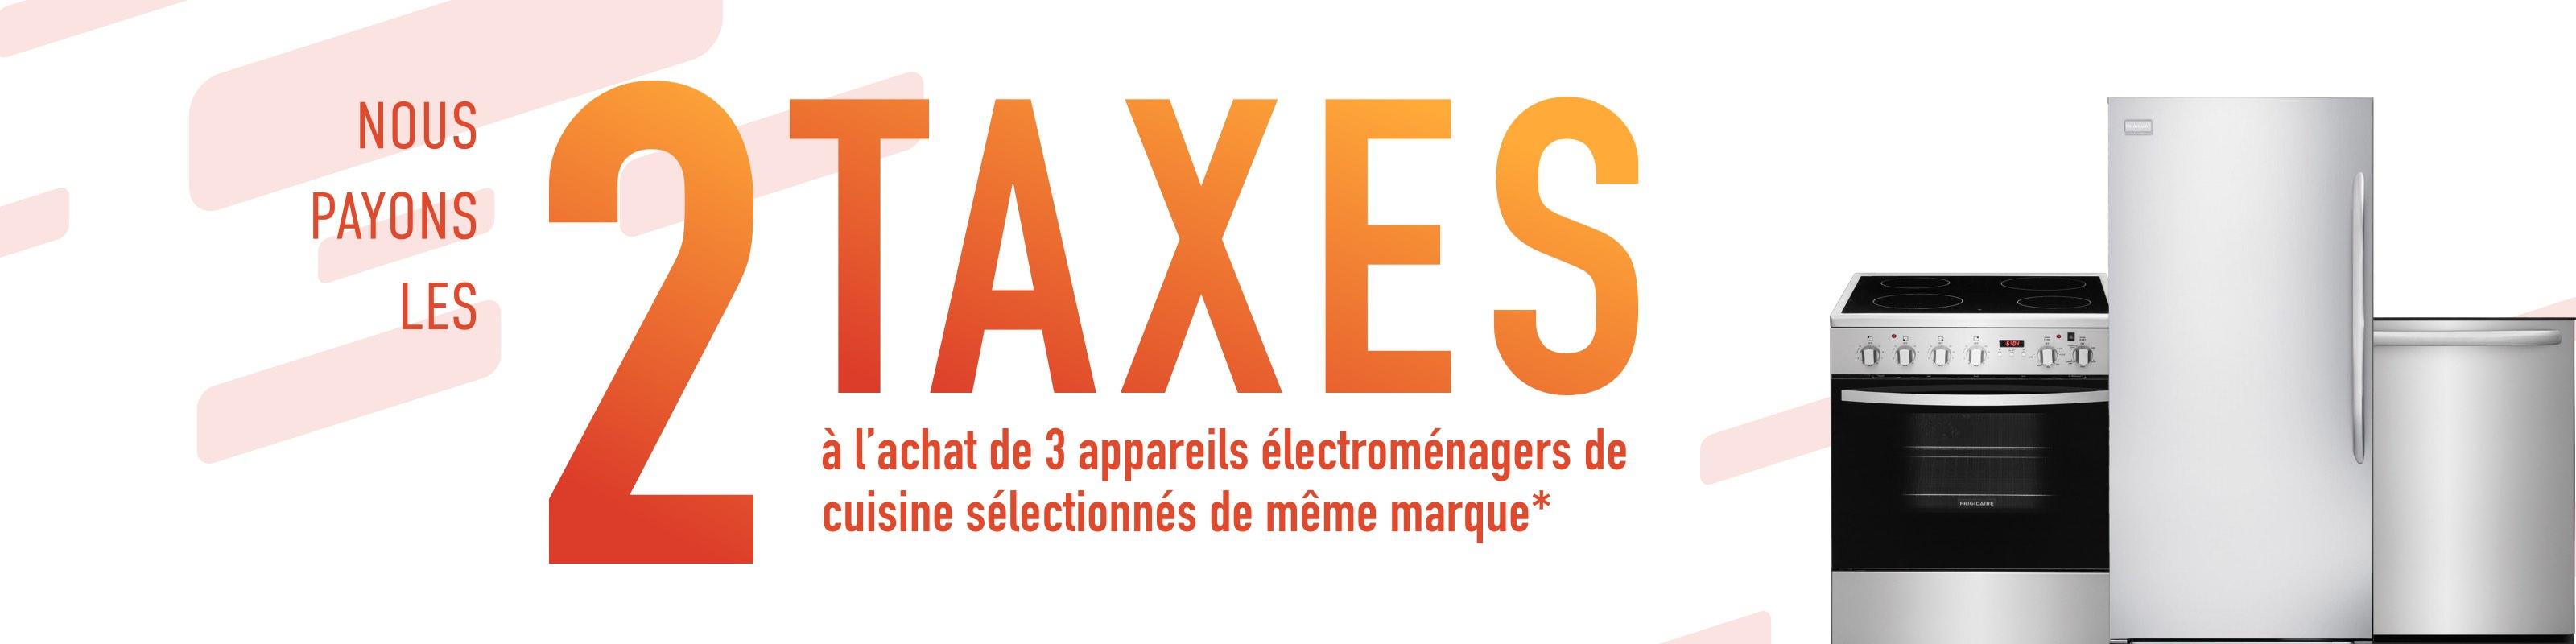 https://cdn.tanguay.ca/userfiles/images/campagne/2021/liquida/10-octobre/web_carrousel_1600x400_2taxes_electromenagers_2x.jpg